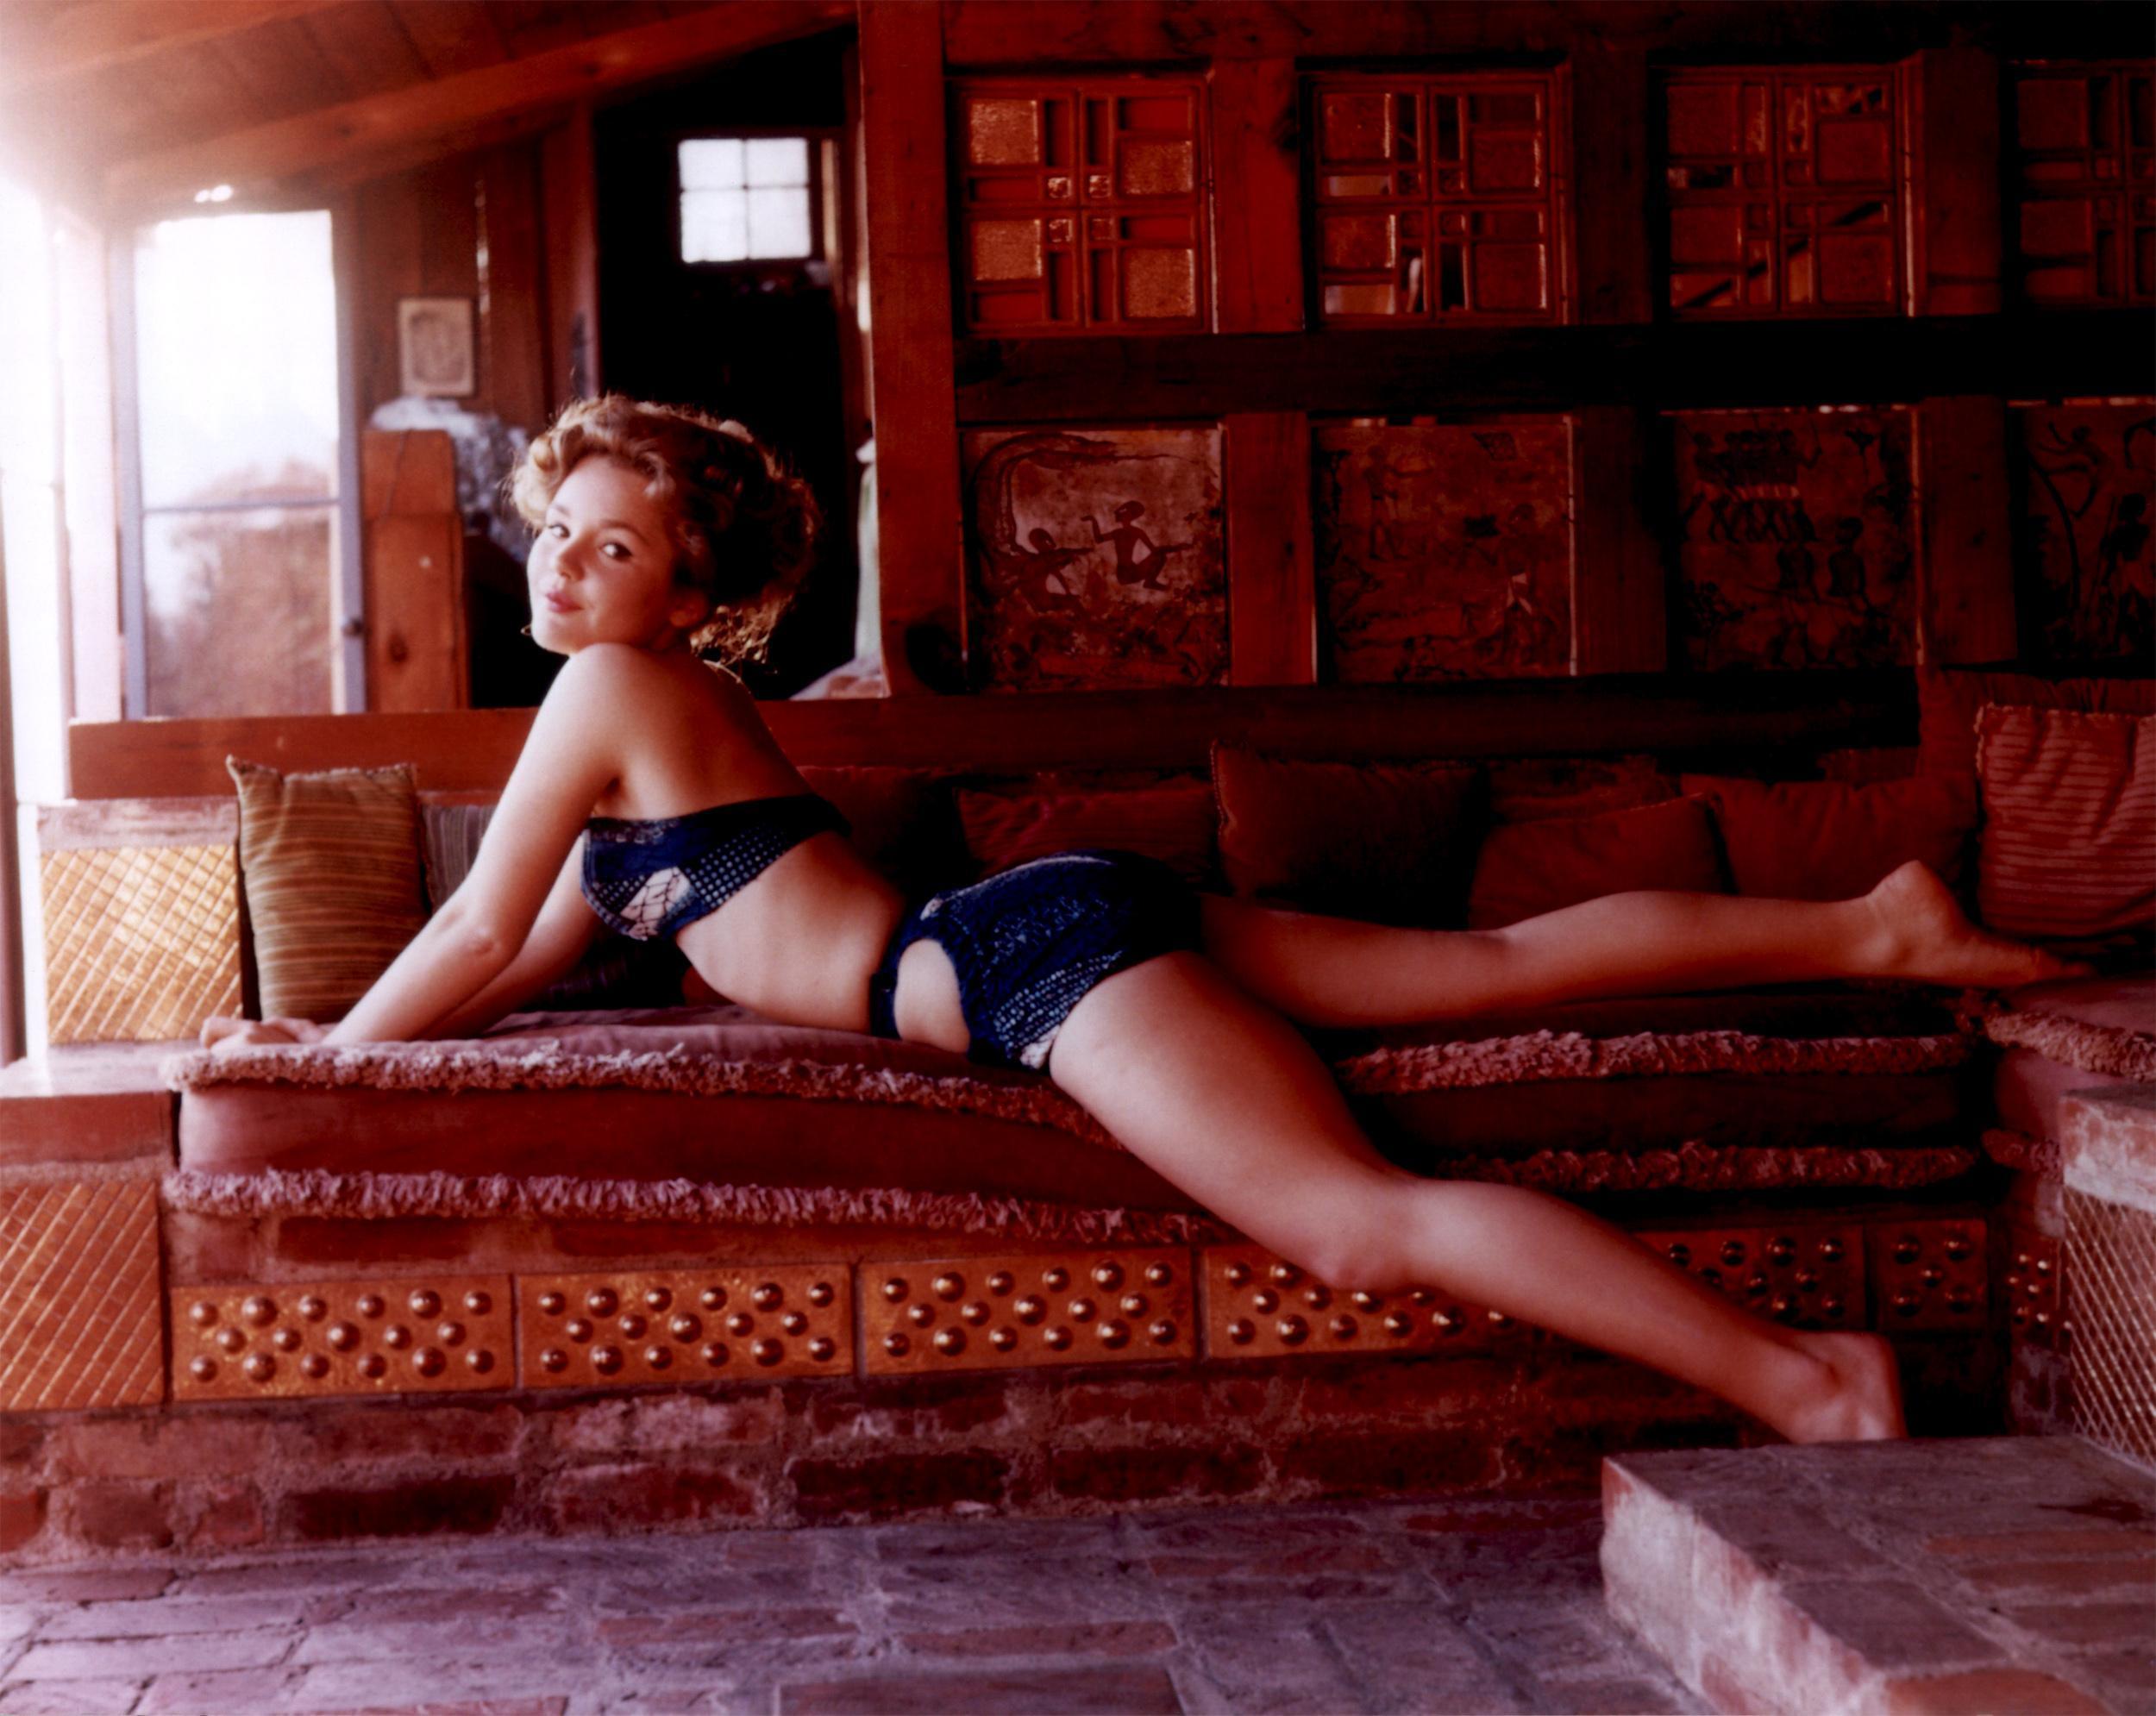 Tuesday Weld sexy ass pics